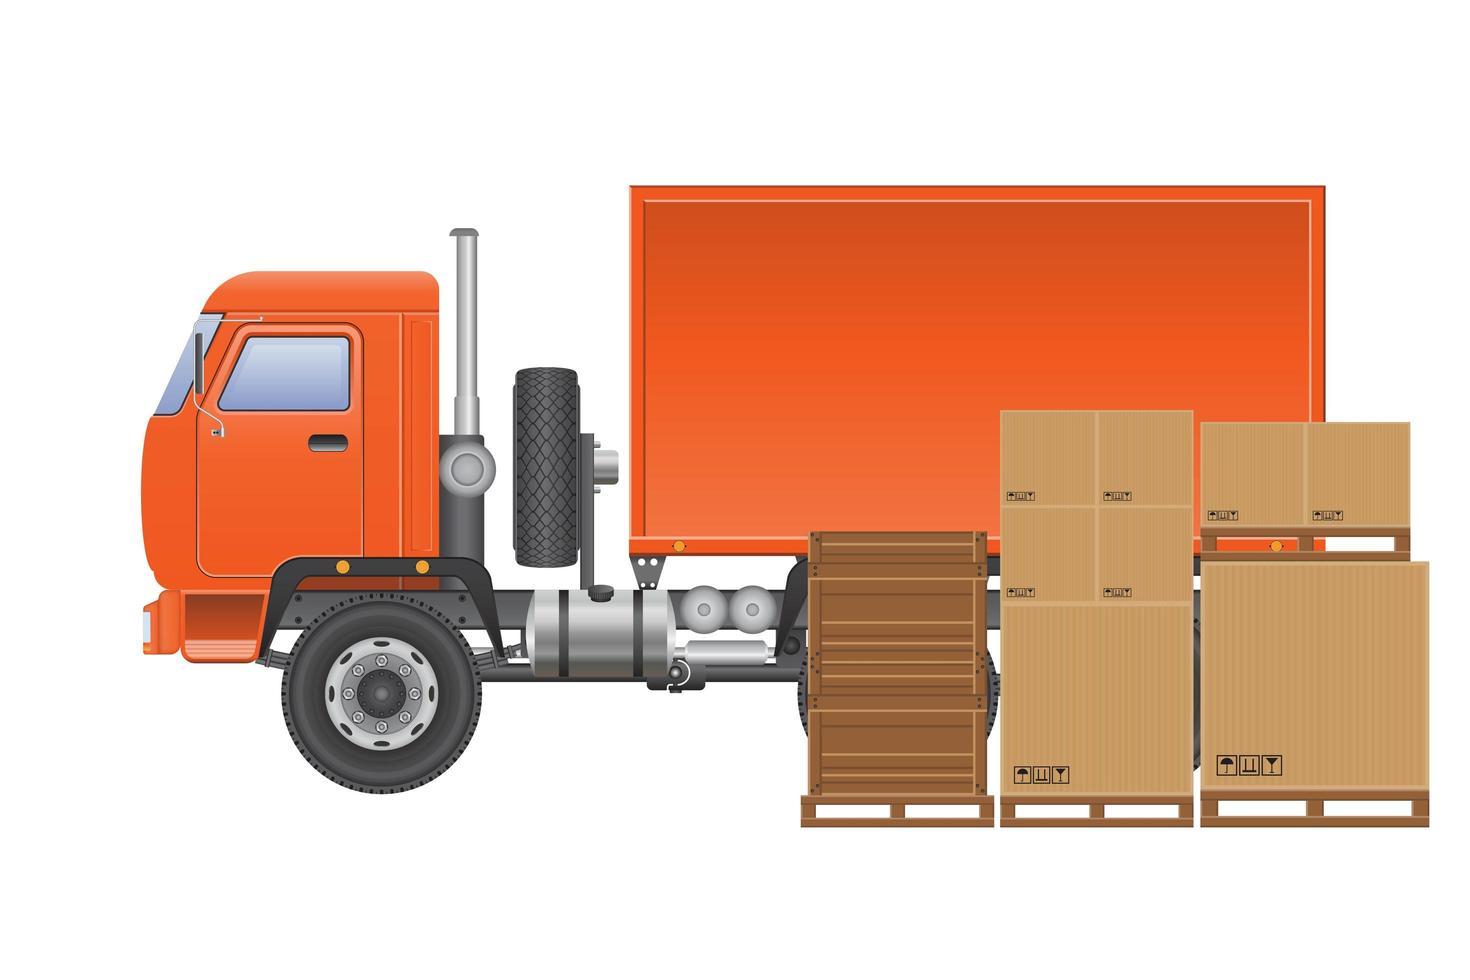 camión de reparto de carga naranja vector